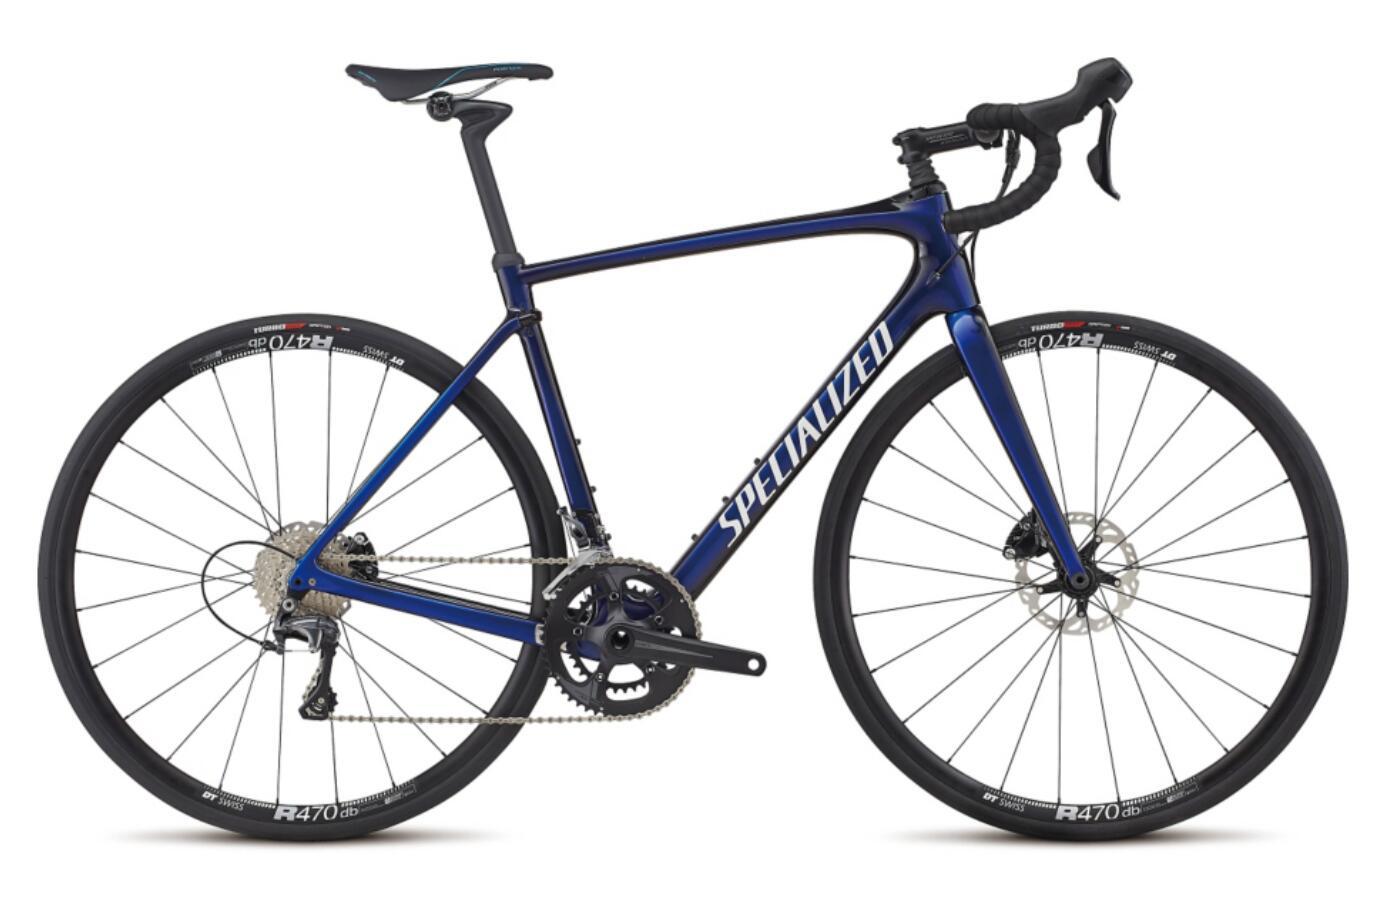 2017 Roubaix Comp Carbon Road Bike